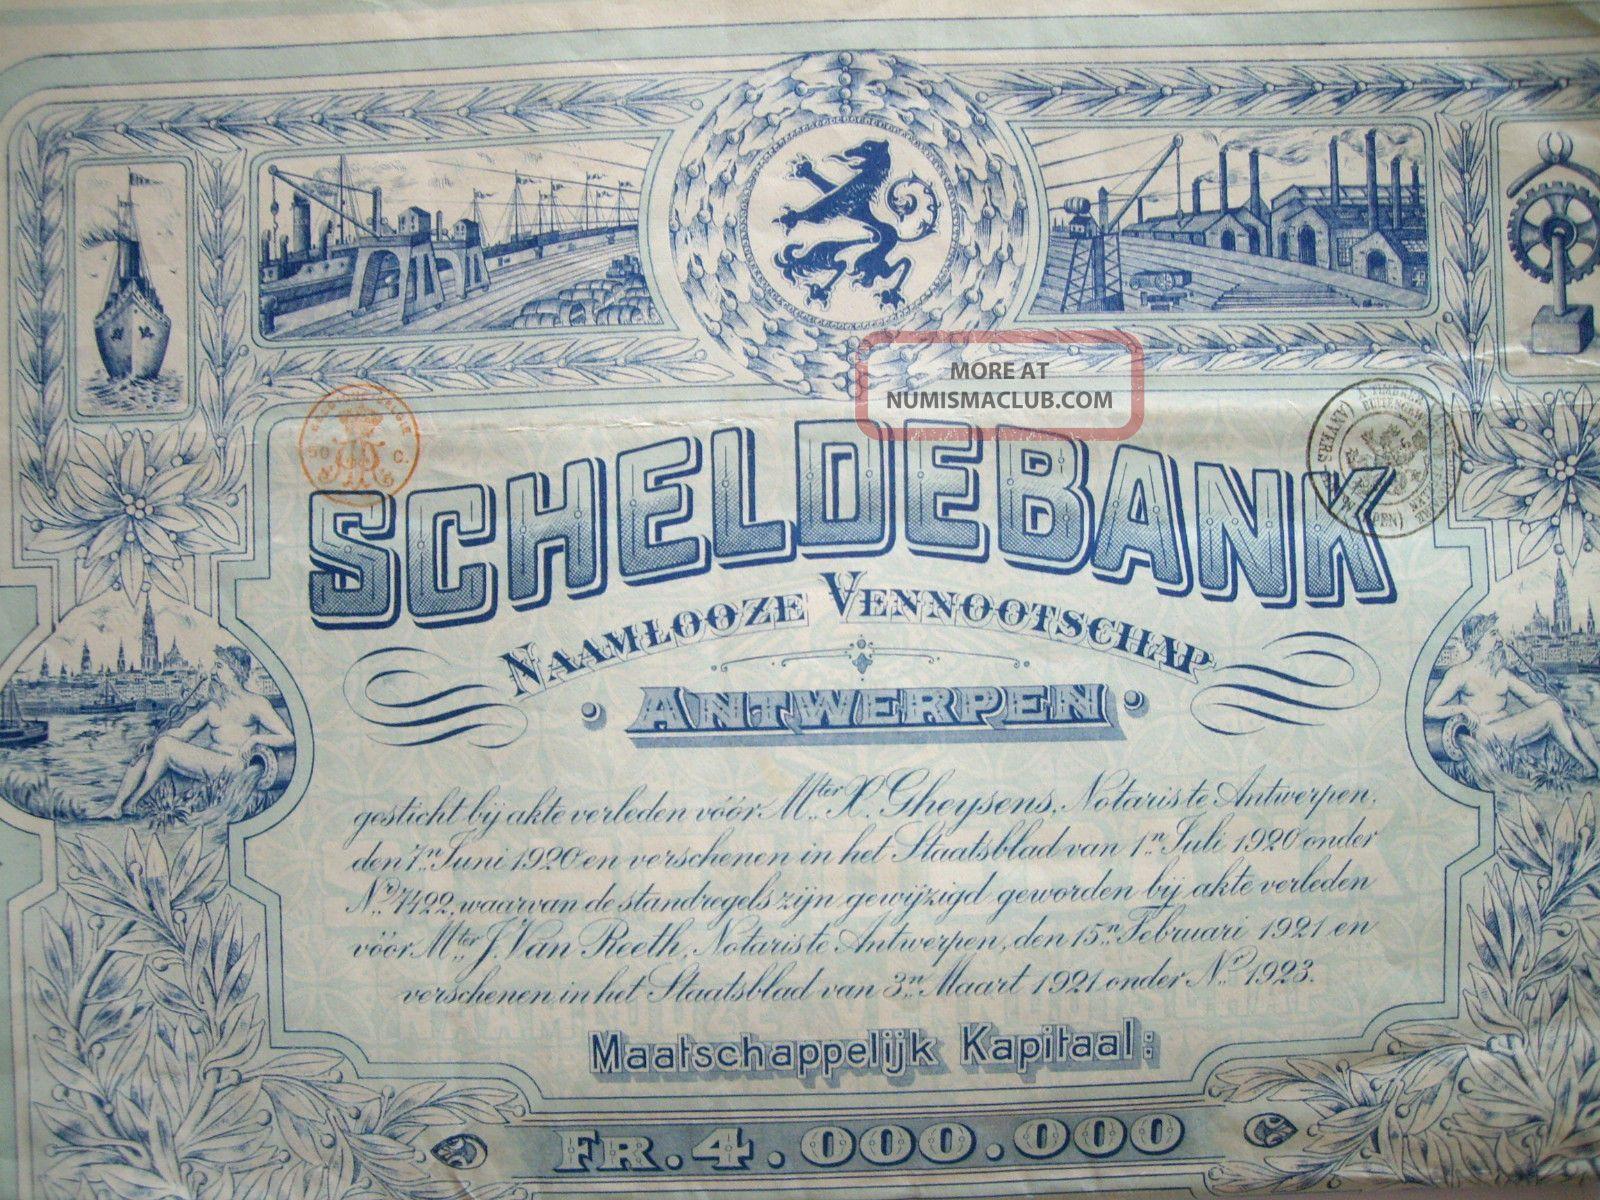 Rare Scheldebank Antwerp Belgium 1923 Top Deco Bank Bond Share Loan World photo